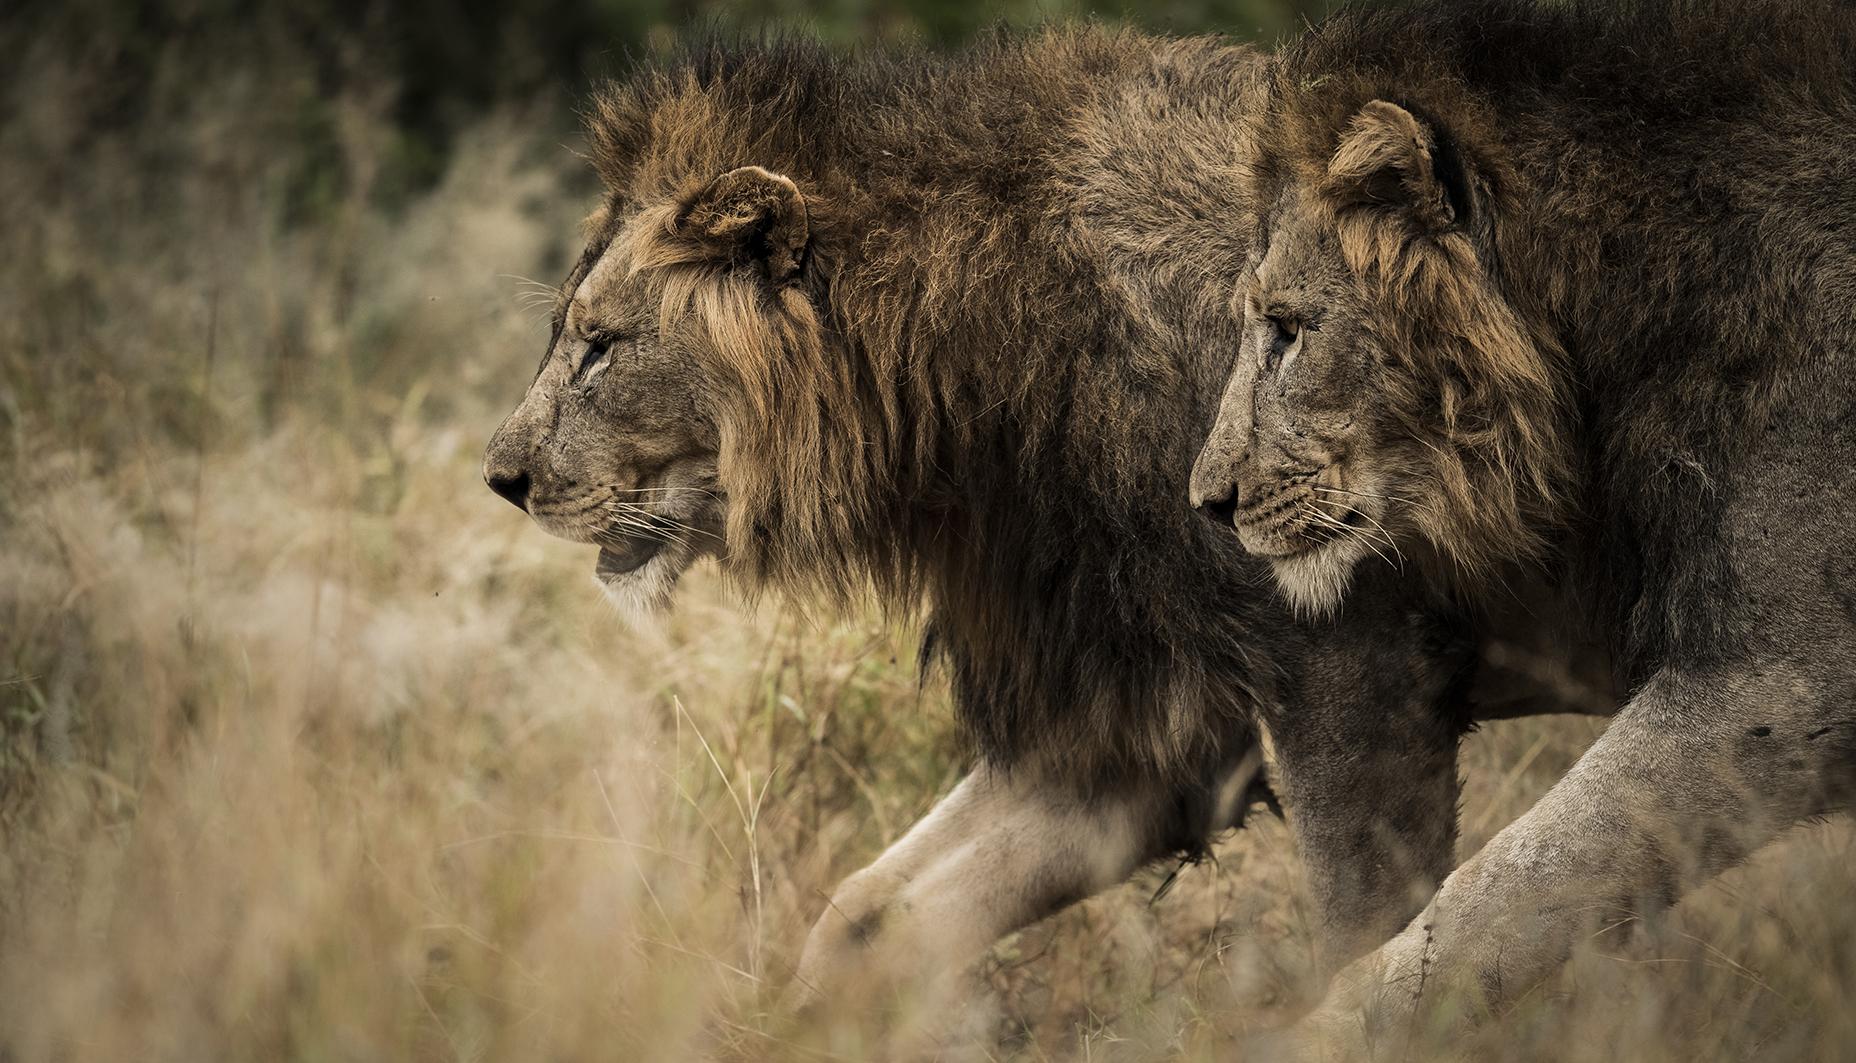 Trai Anfield Photography safaris lions S